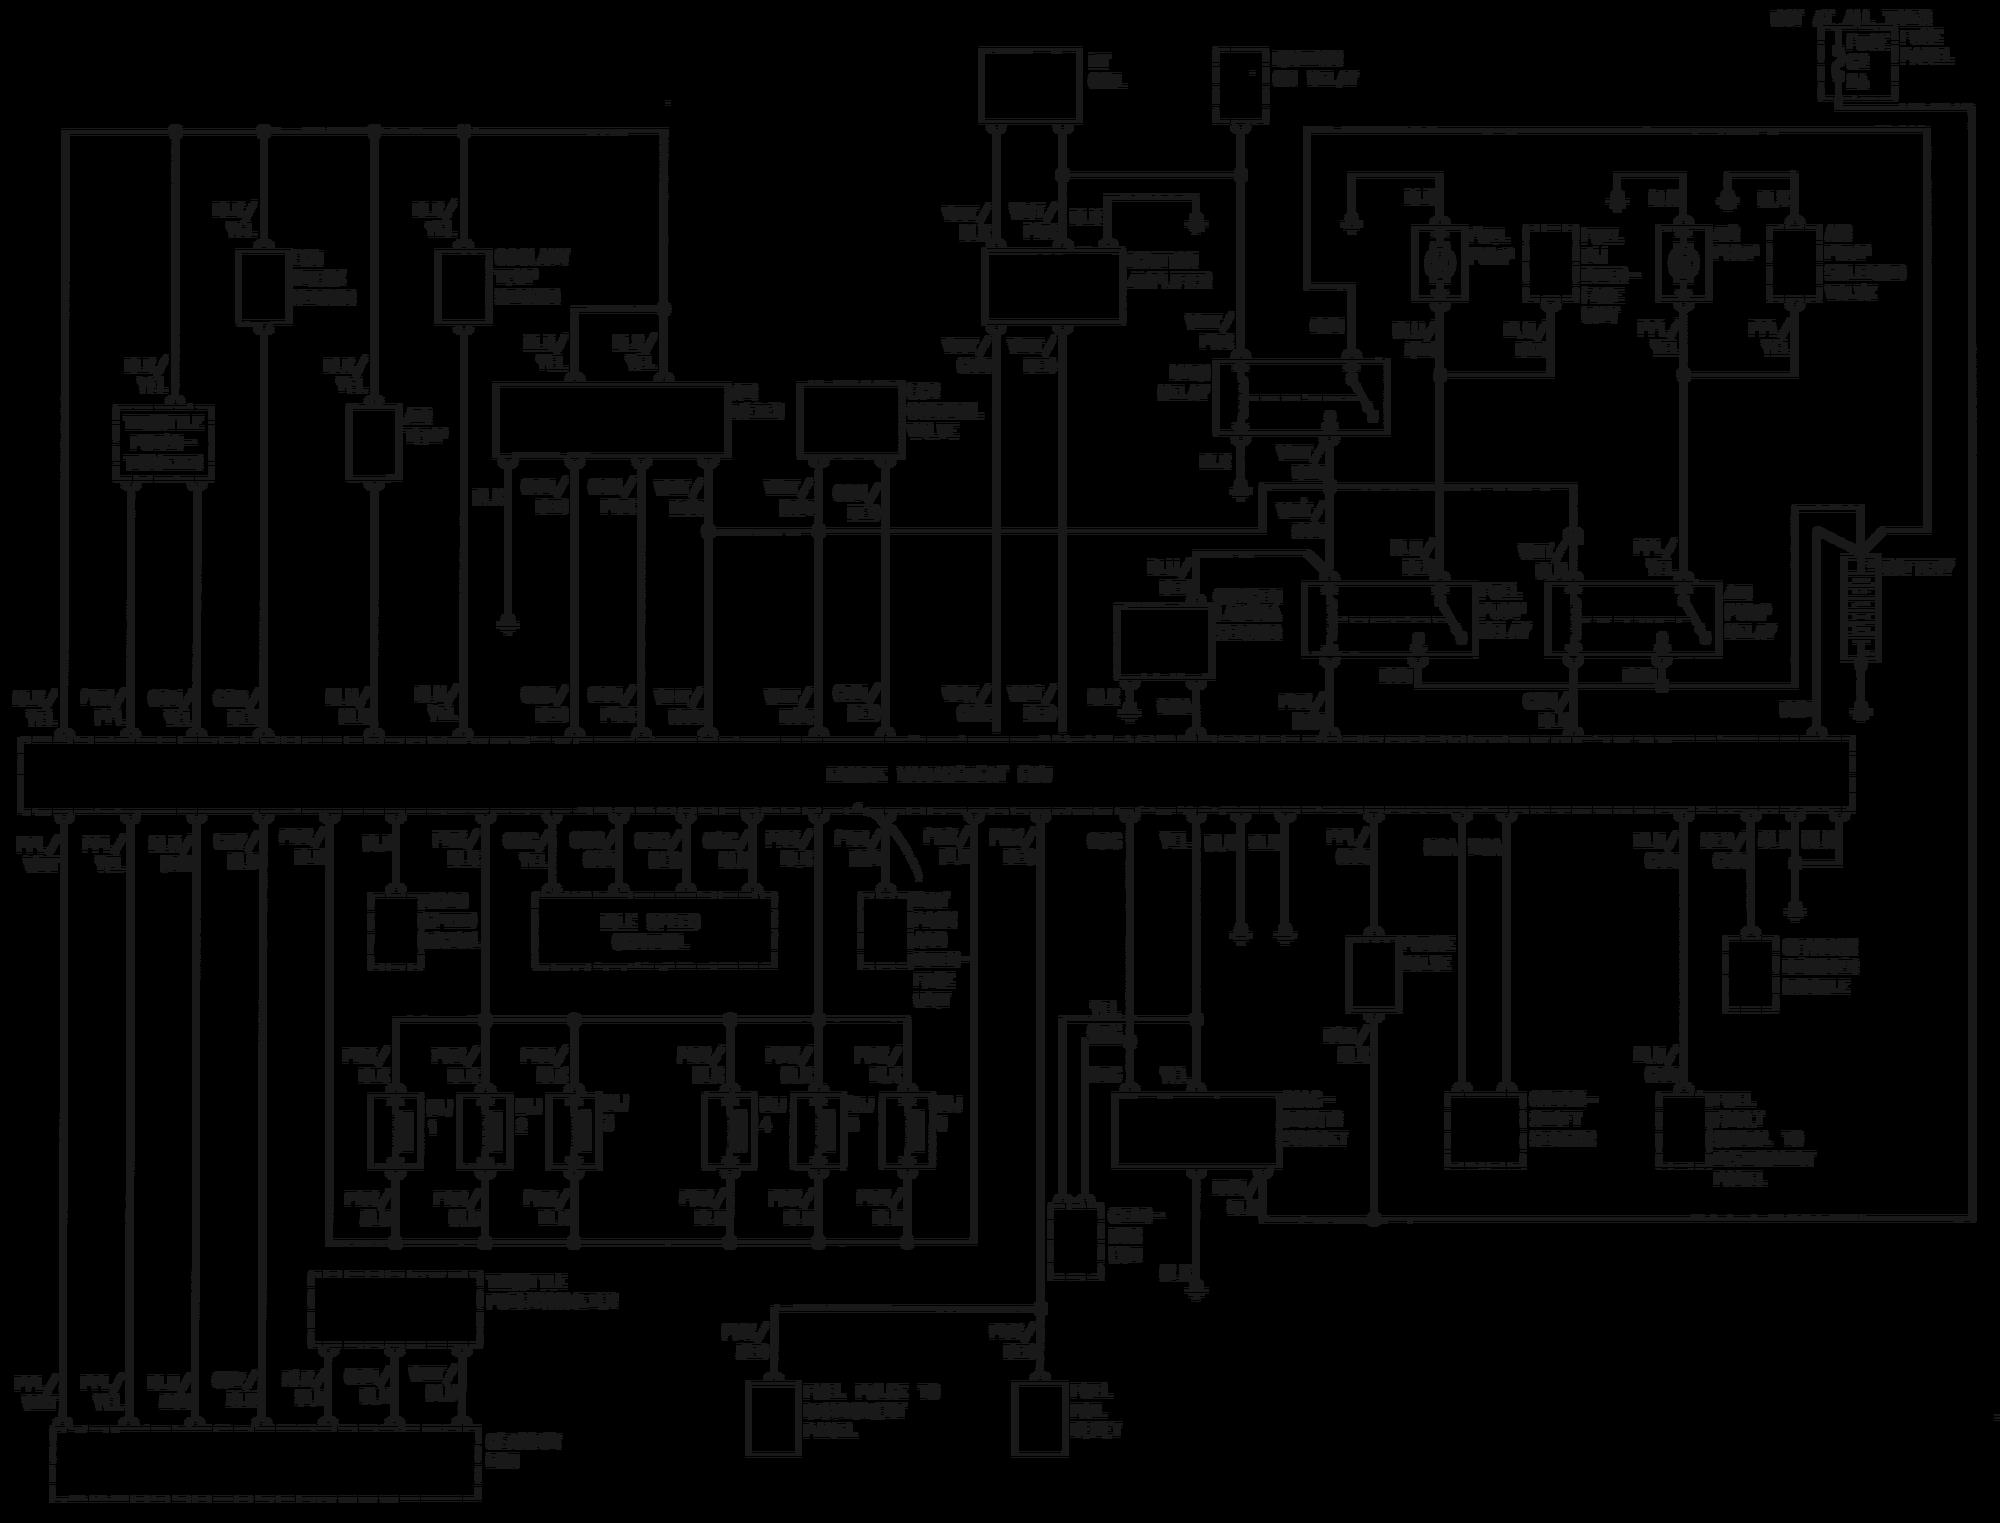 Diagram Jaguar Xj6 Radio Wiring Diagram Full Version Hd Quality Wiring Diagram Blogxgoo Mefpie Fr